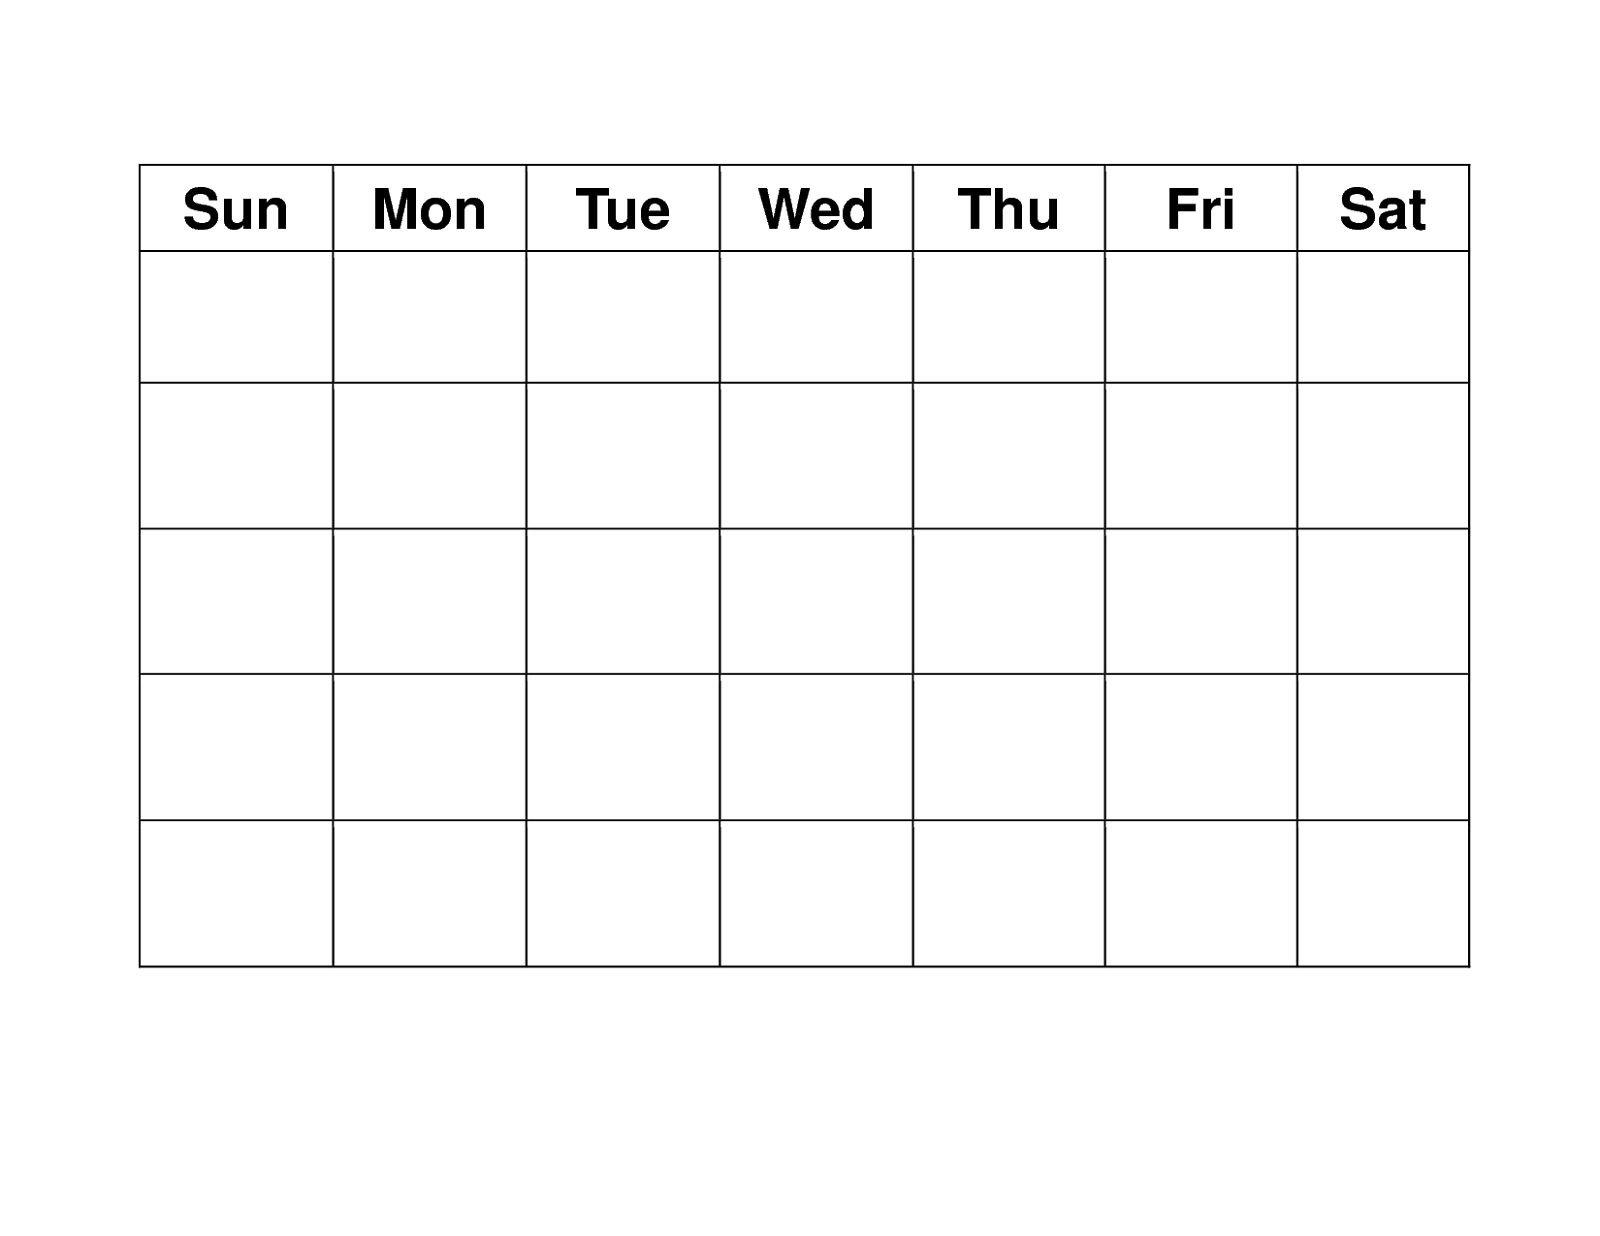 Get Blank Weekly Calendar To Fill In | Blank Calendar Free Fill In Weekly Schedule